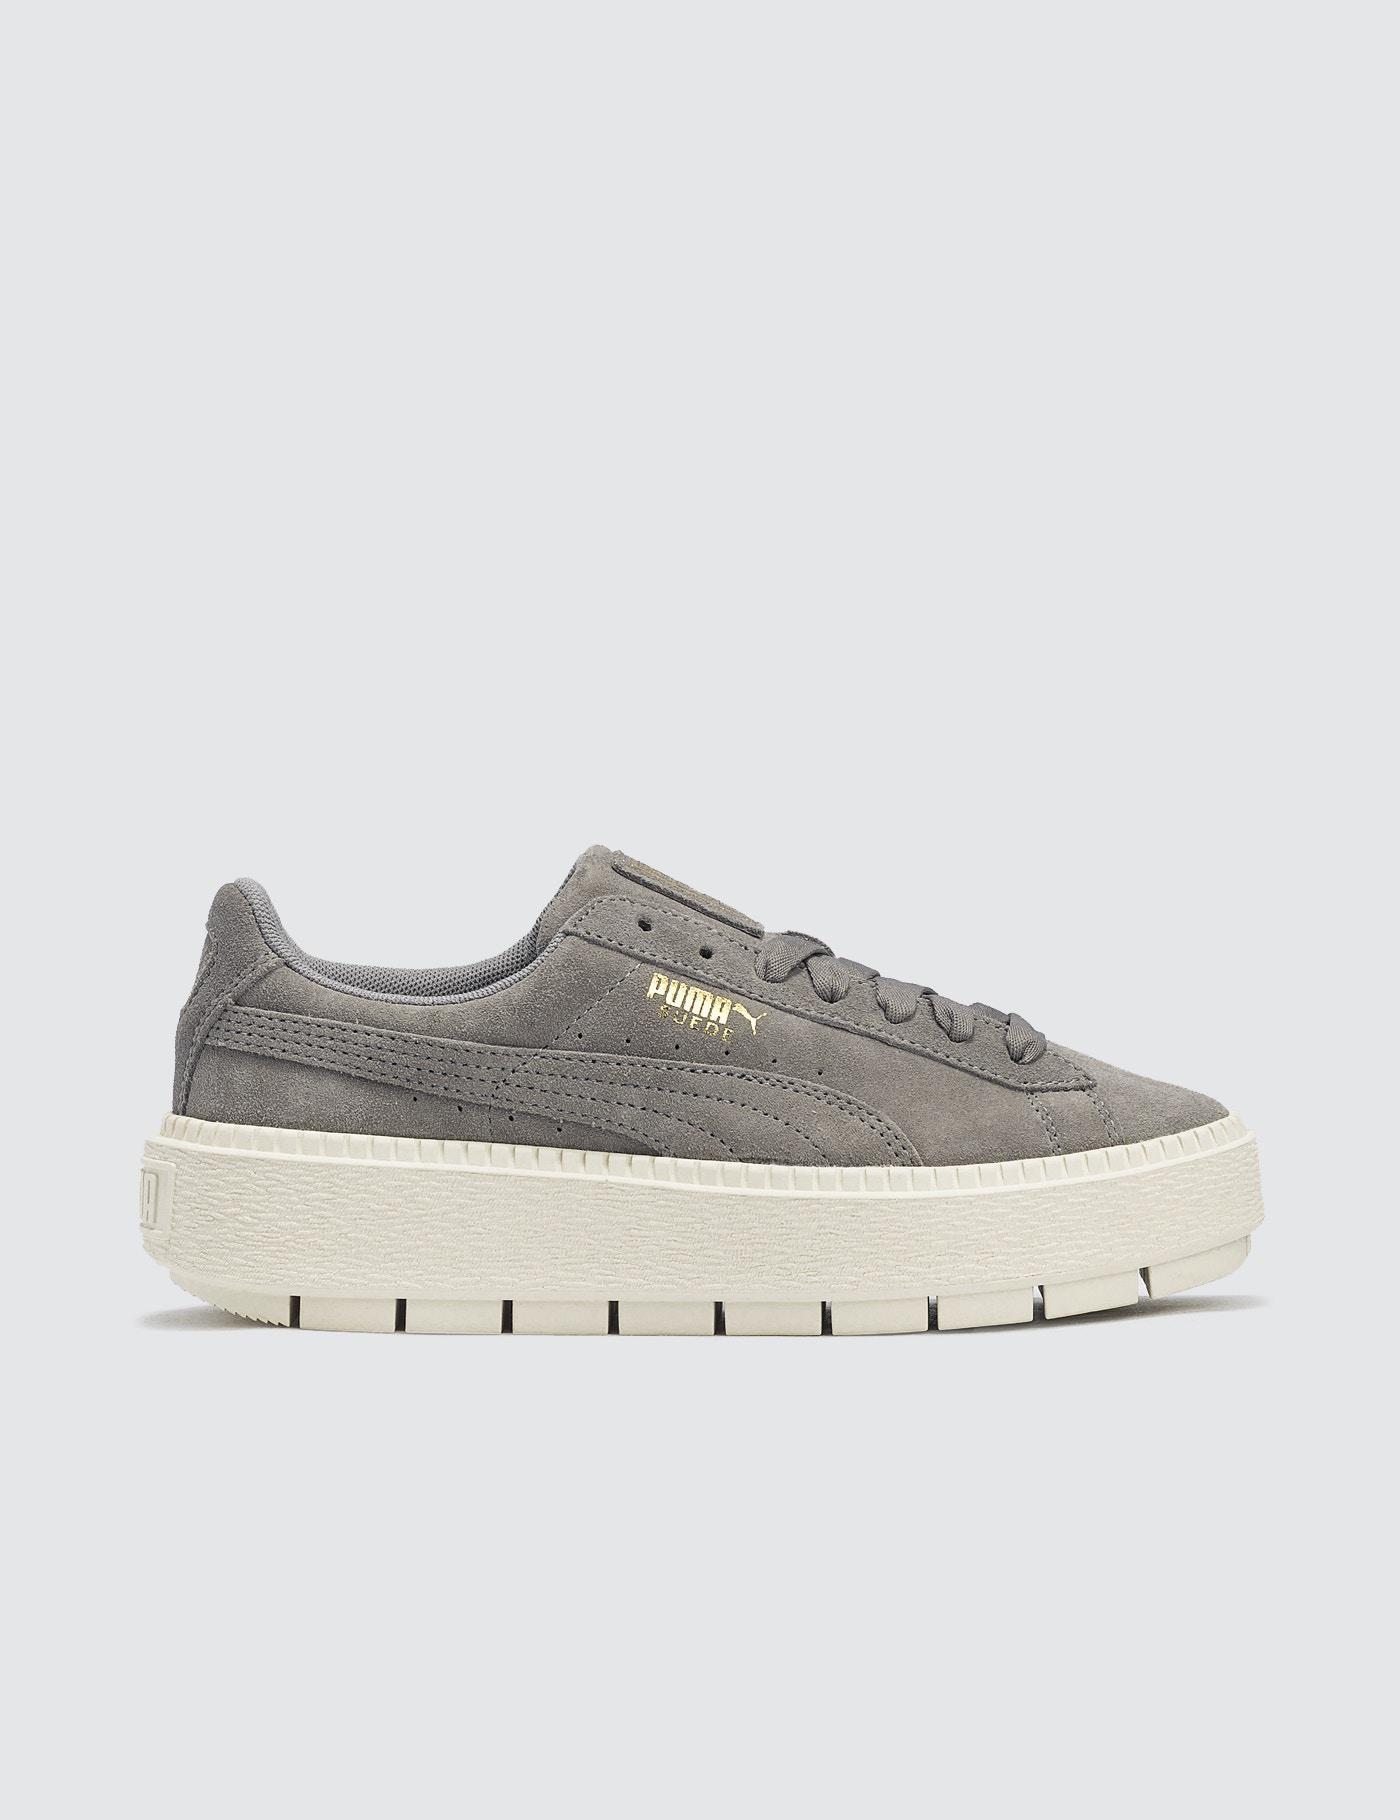 puma suede platform trace grey